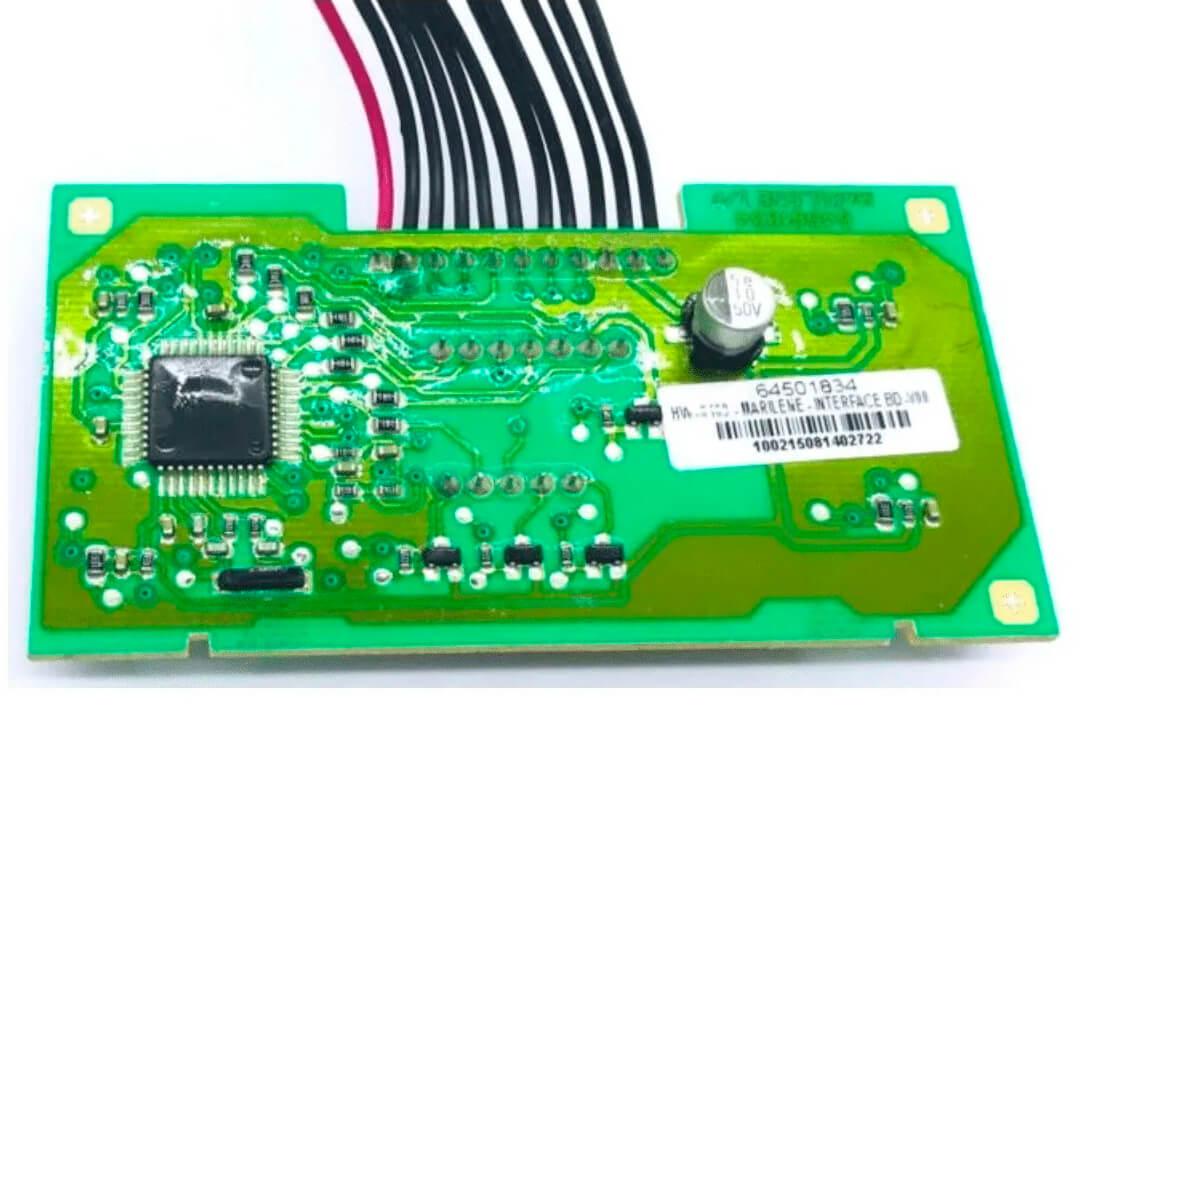 Placa Interface Timer Para Fogão Electrolux 76srb 76srx 52srb 52rbl - 70202102